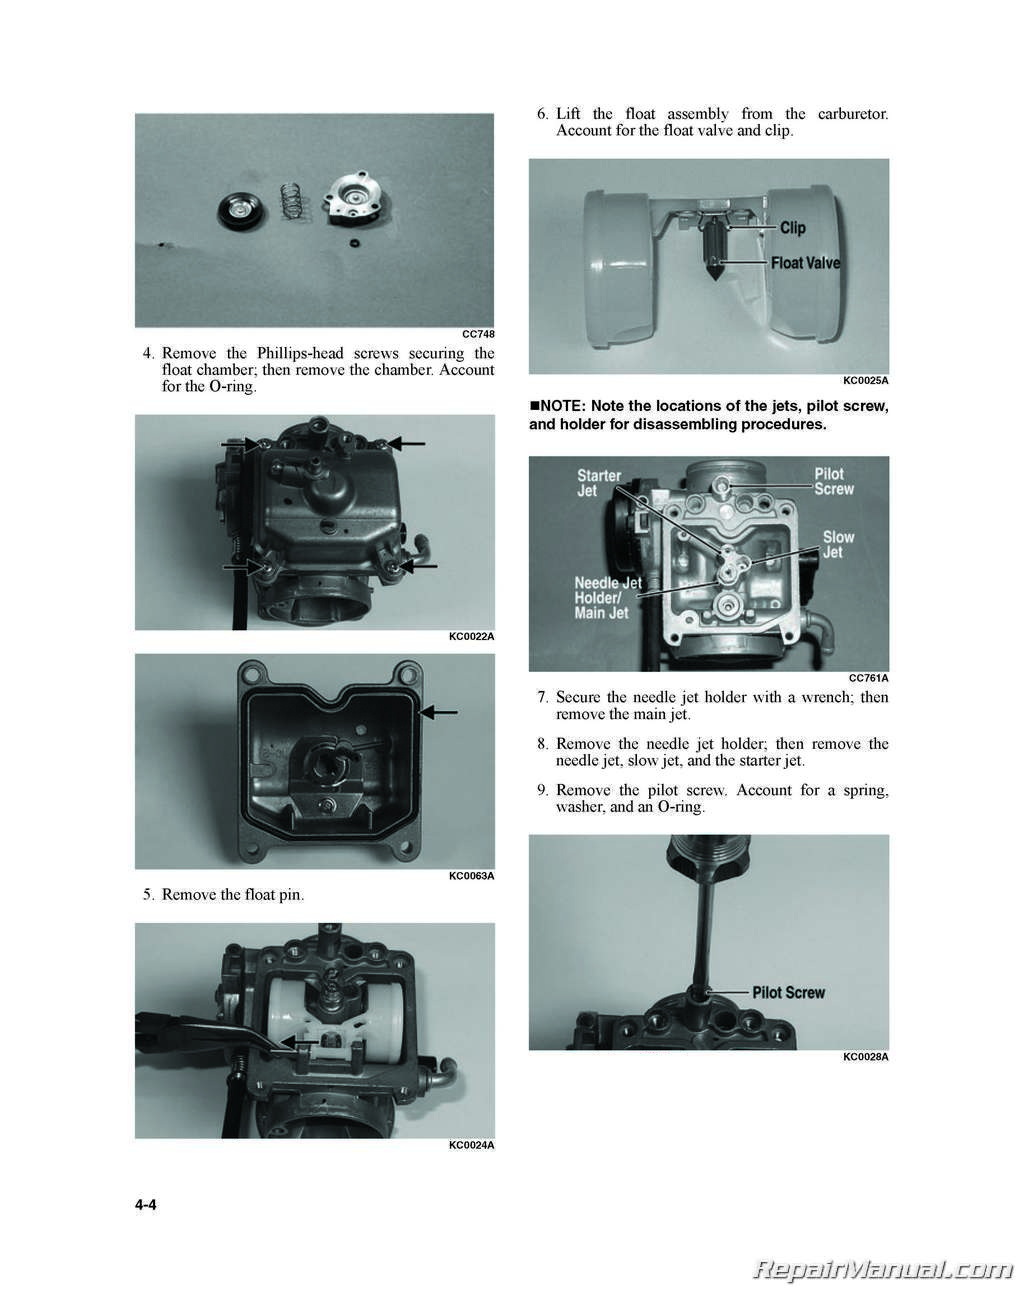 Kymco Mxu 150 Atv Service Manual Printed By Cyclepedia